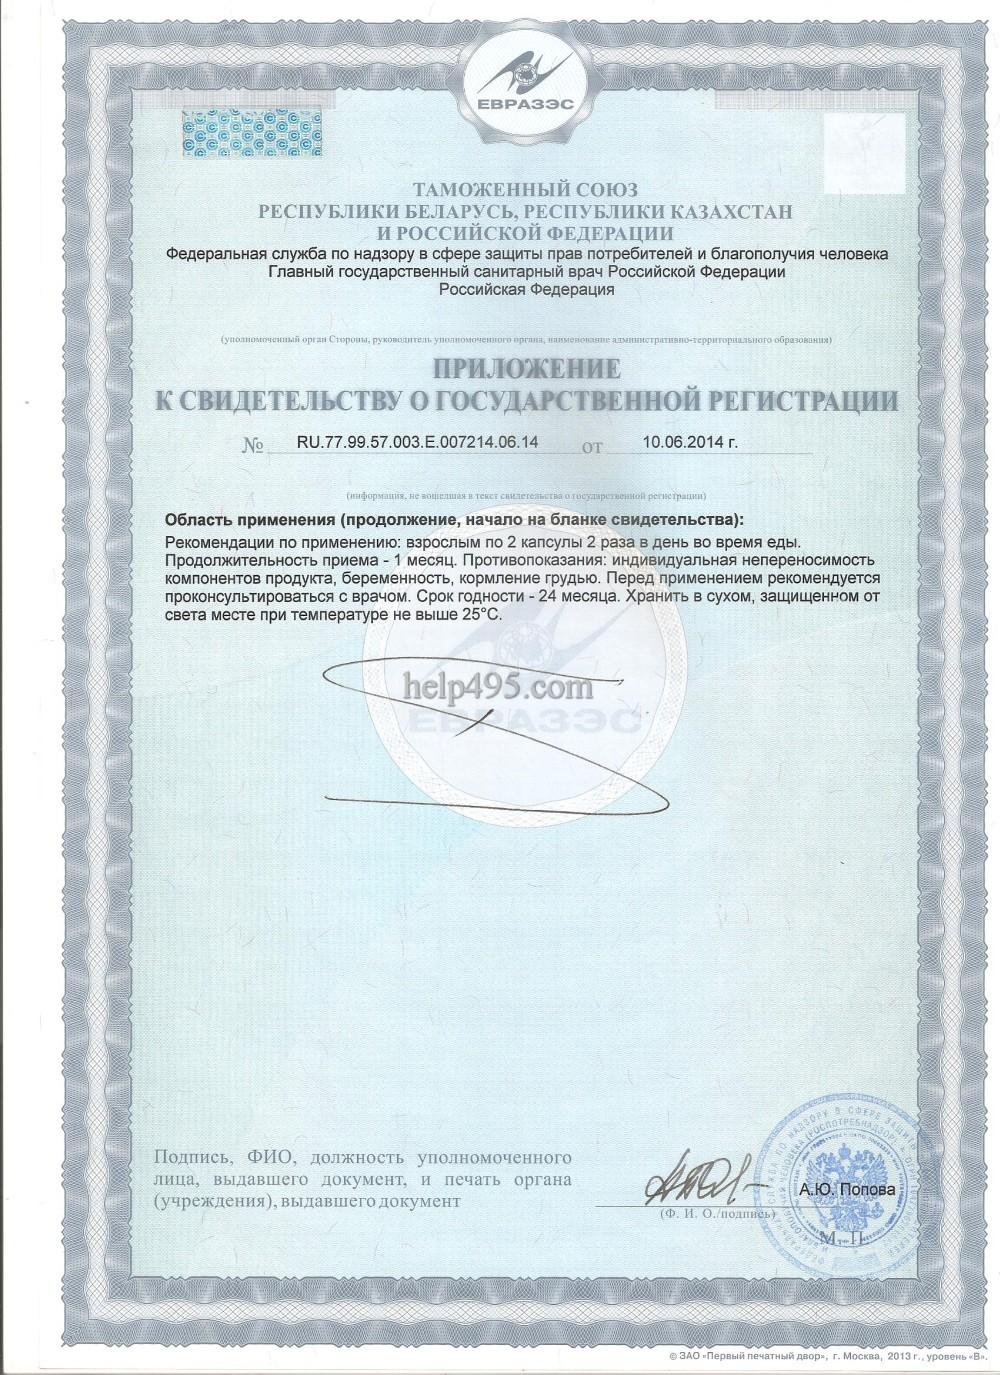 2-ая стр. сертификата препарата: Капсулы с расверотролом Тяньши